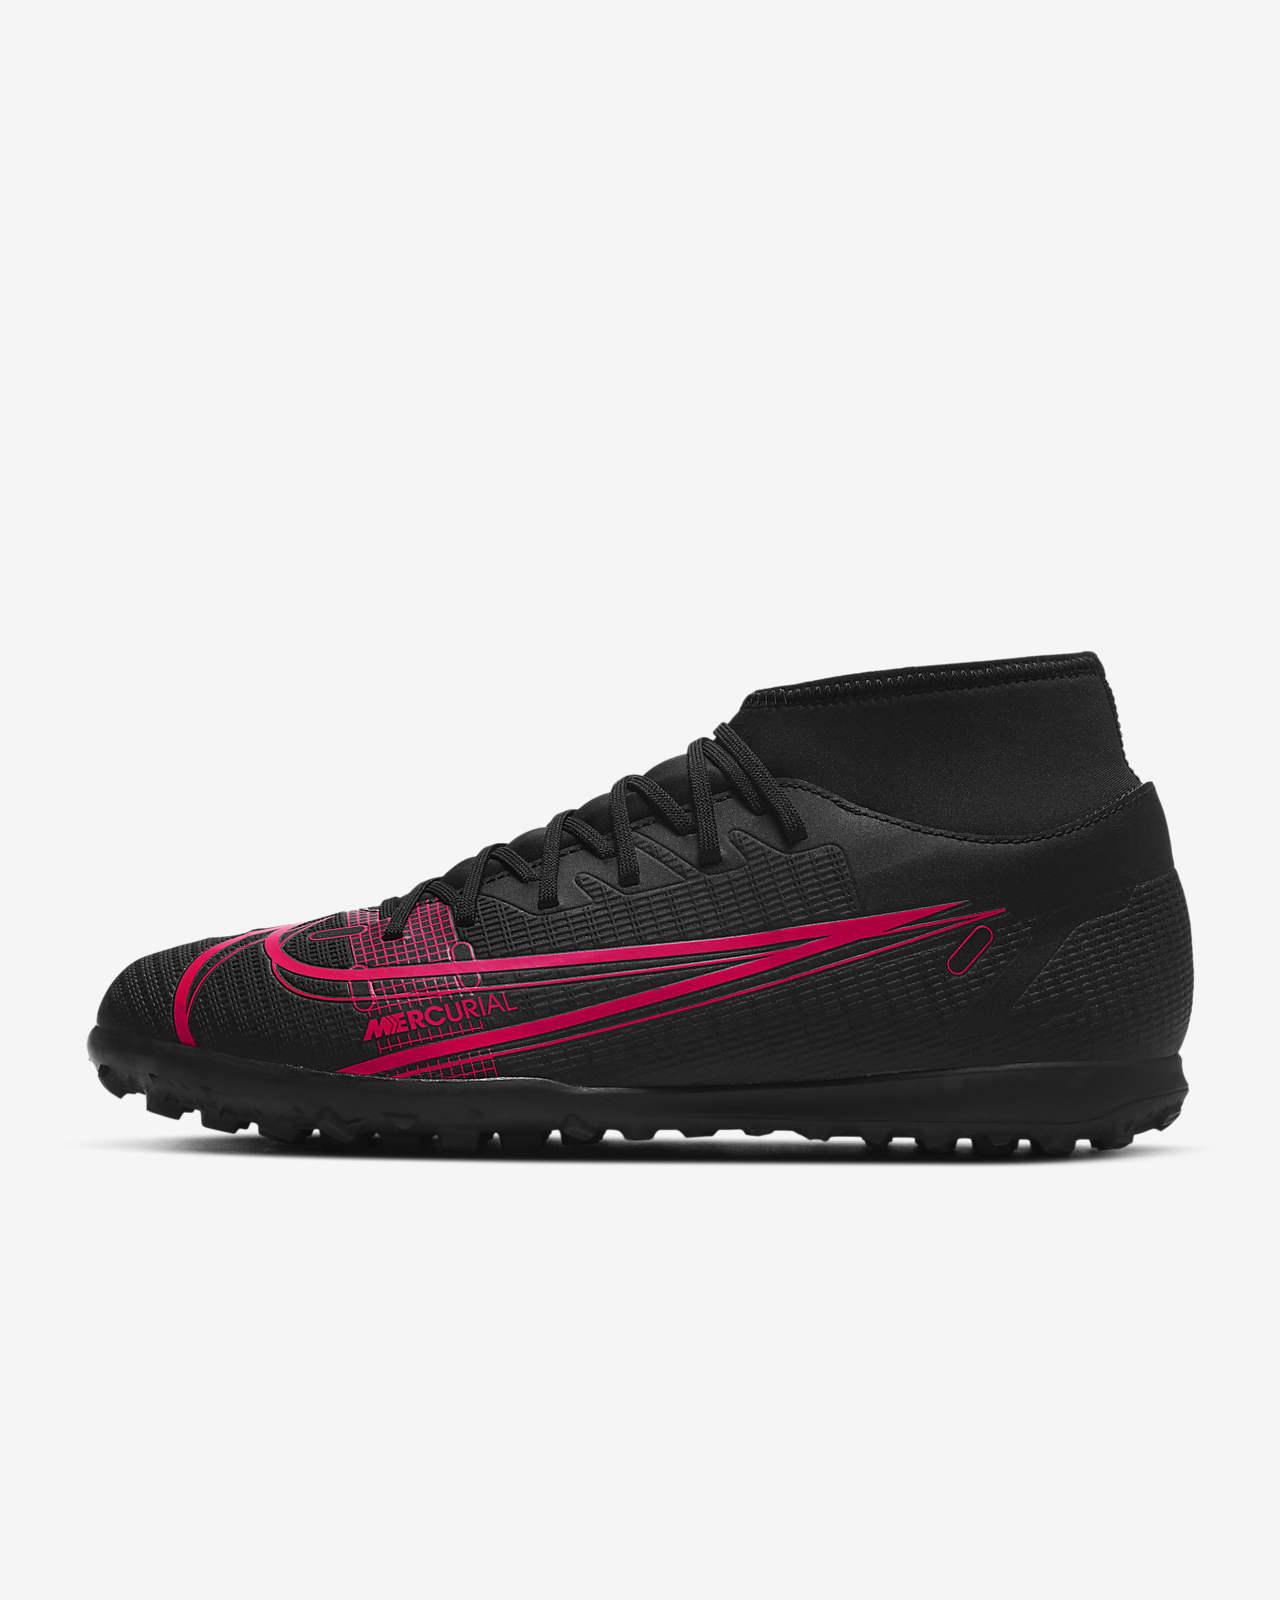 Nike Mercurial Superfly 8 Club TF Artificial-Turf Football Shoe